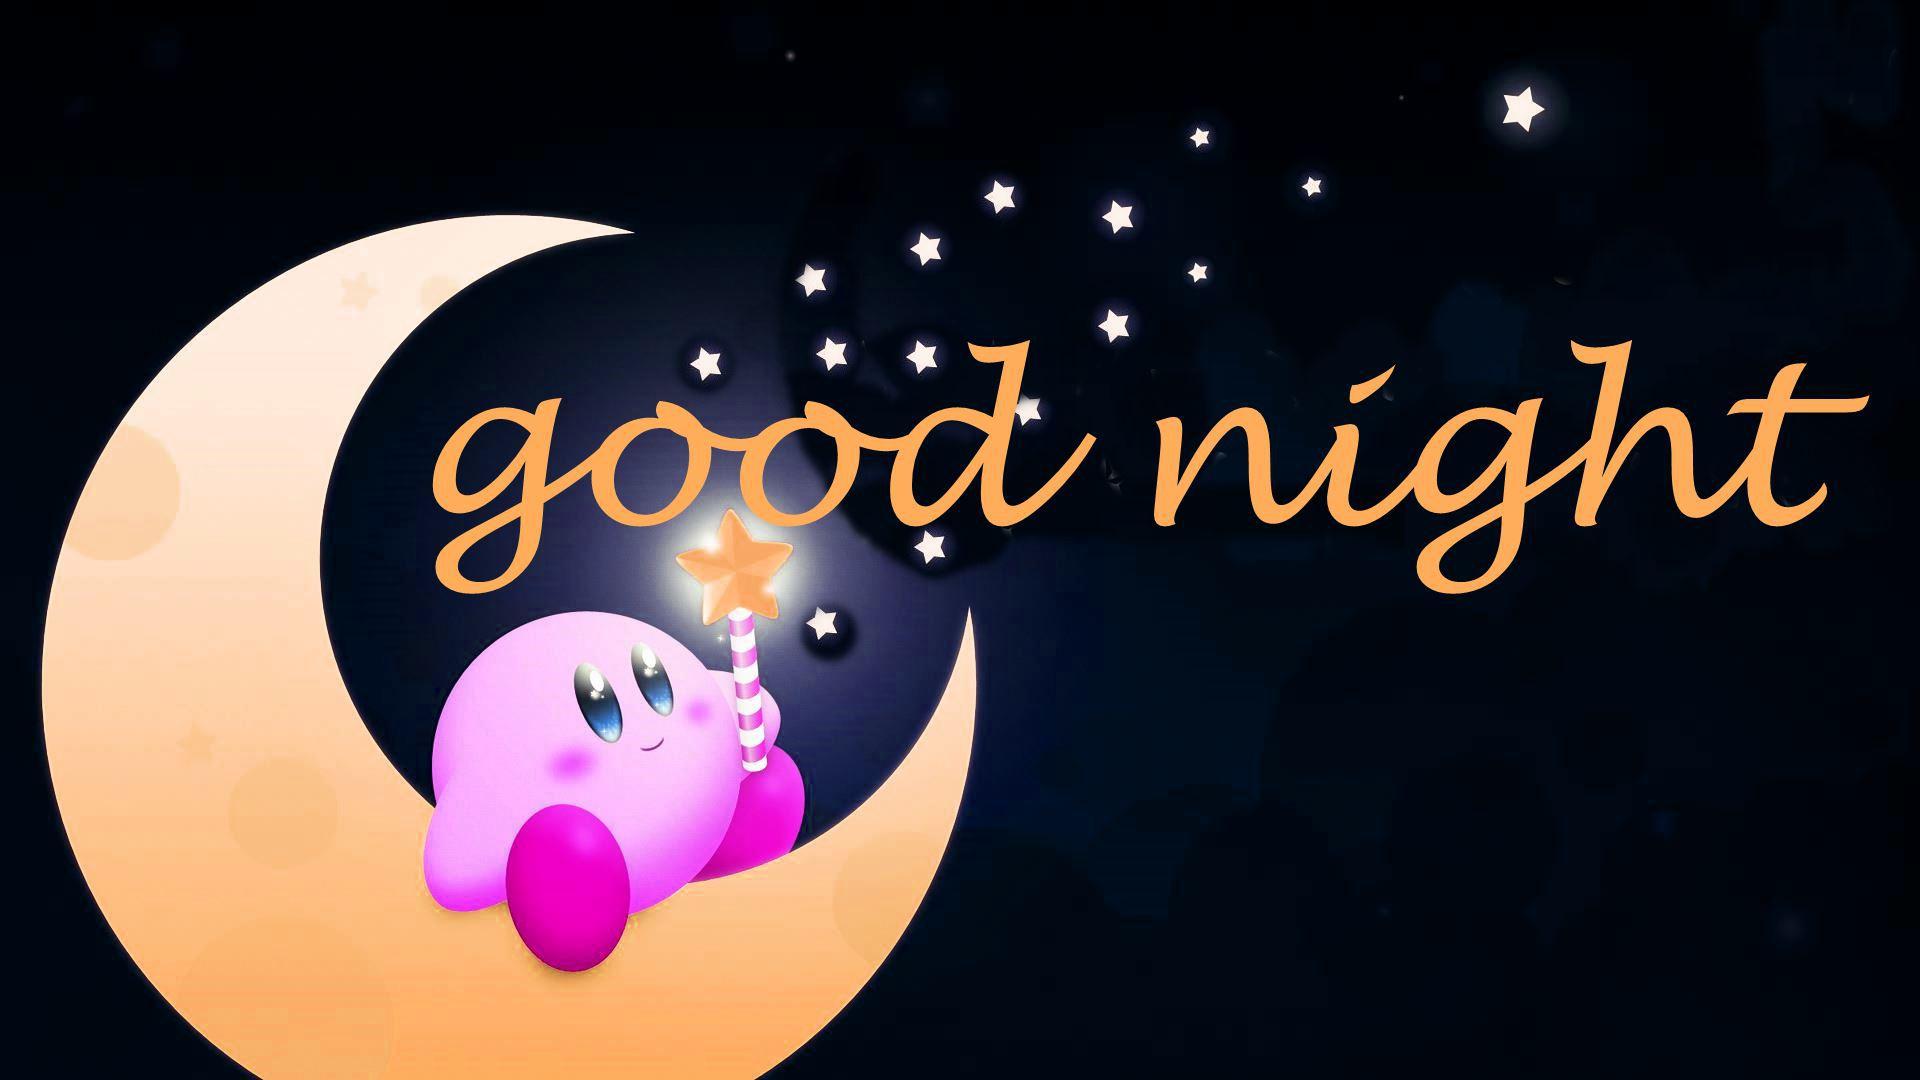 Ảnh good night moon